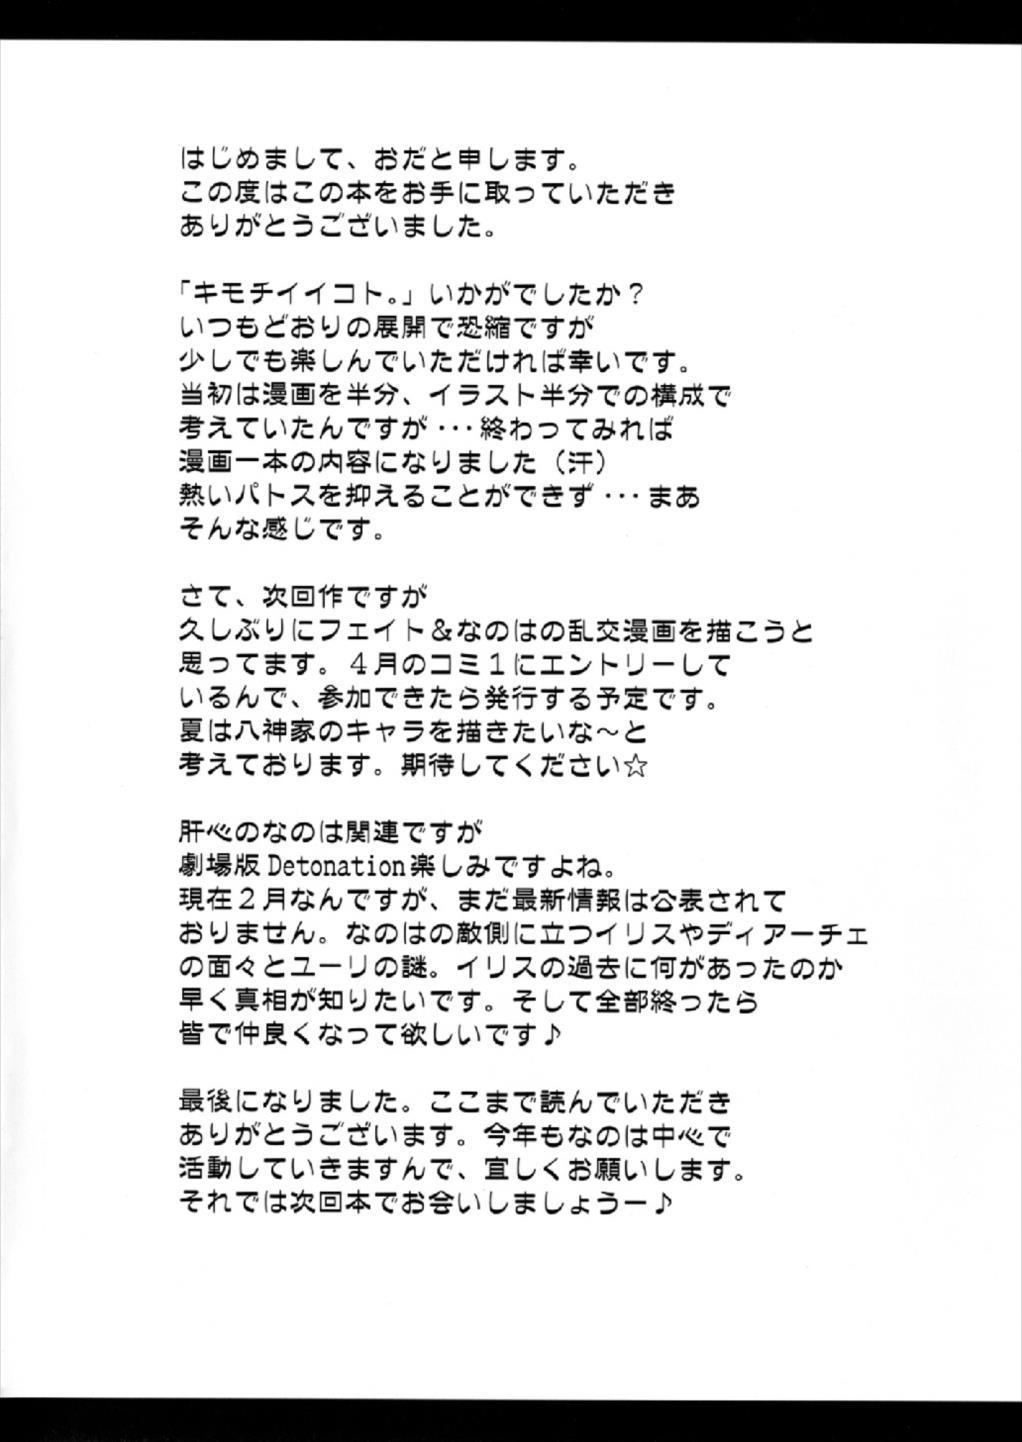 Kimochi Ii Koto. 23